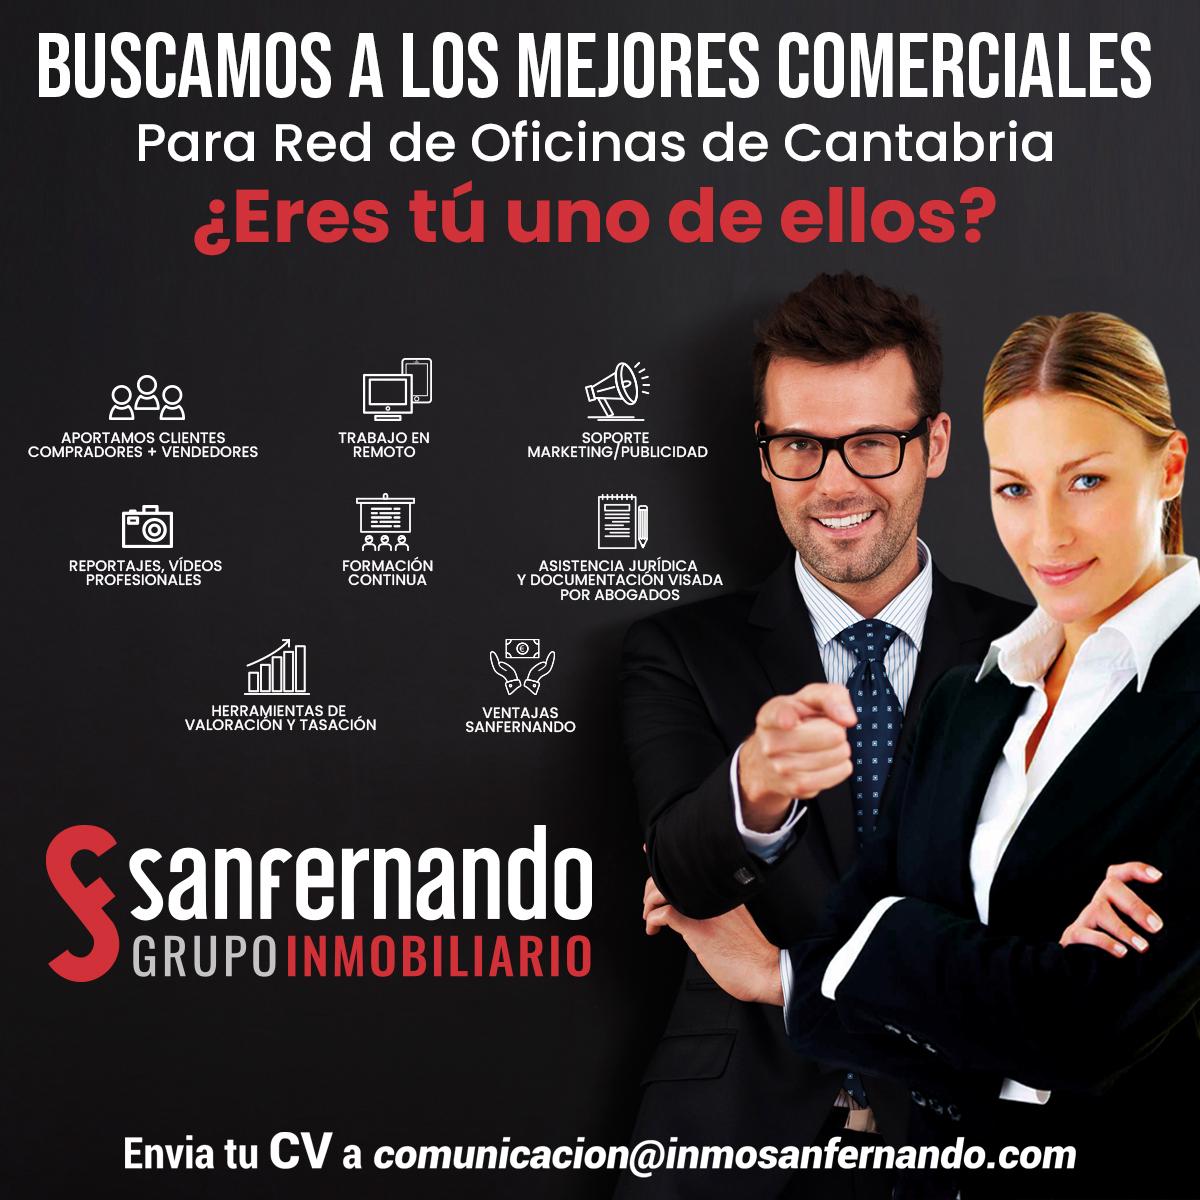 Oferta de empleo en Cantabria Inmobiliaria SanFernando